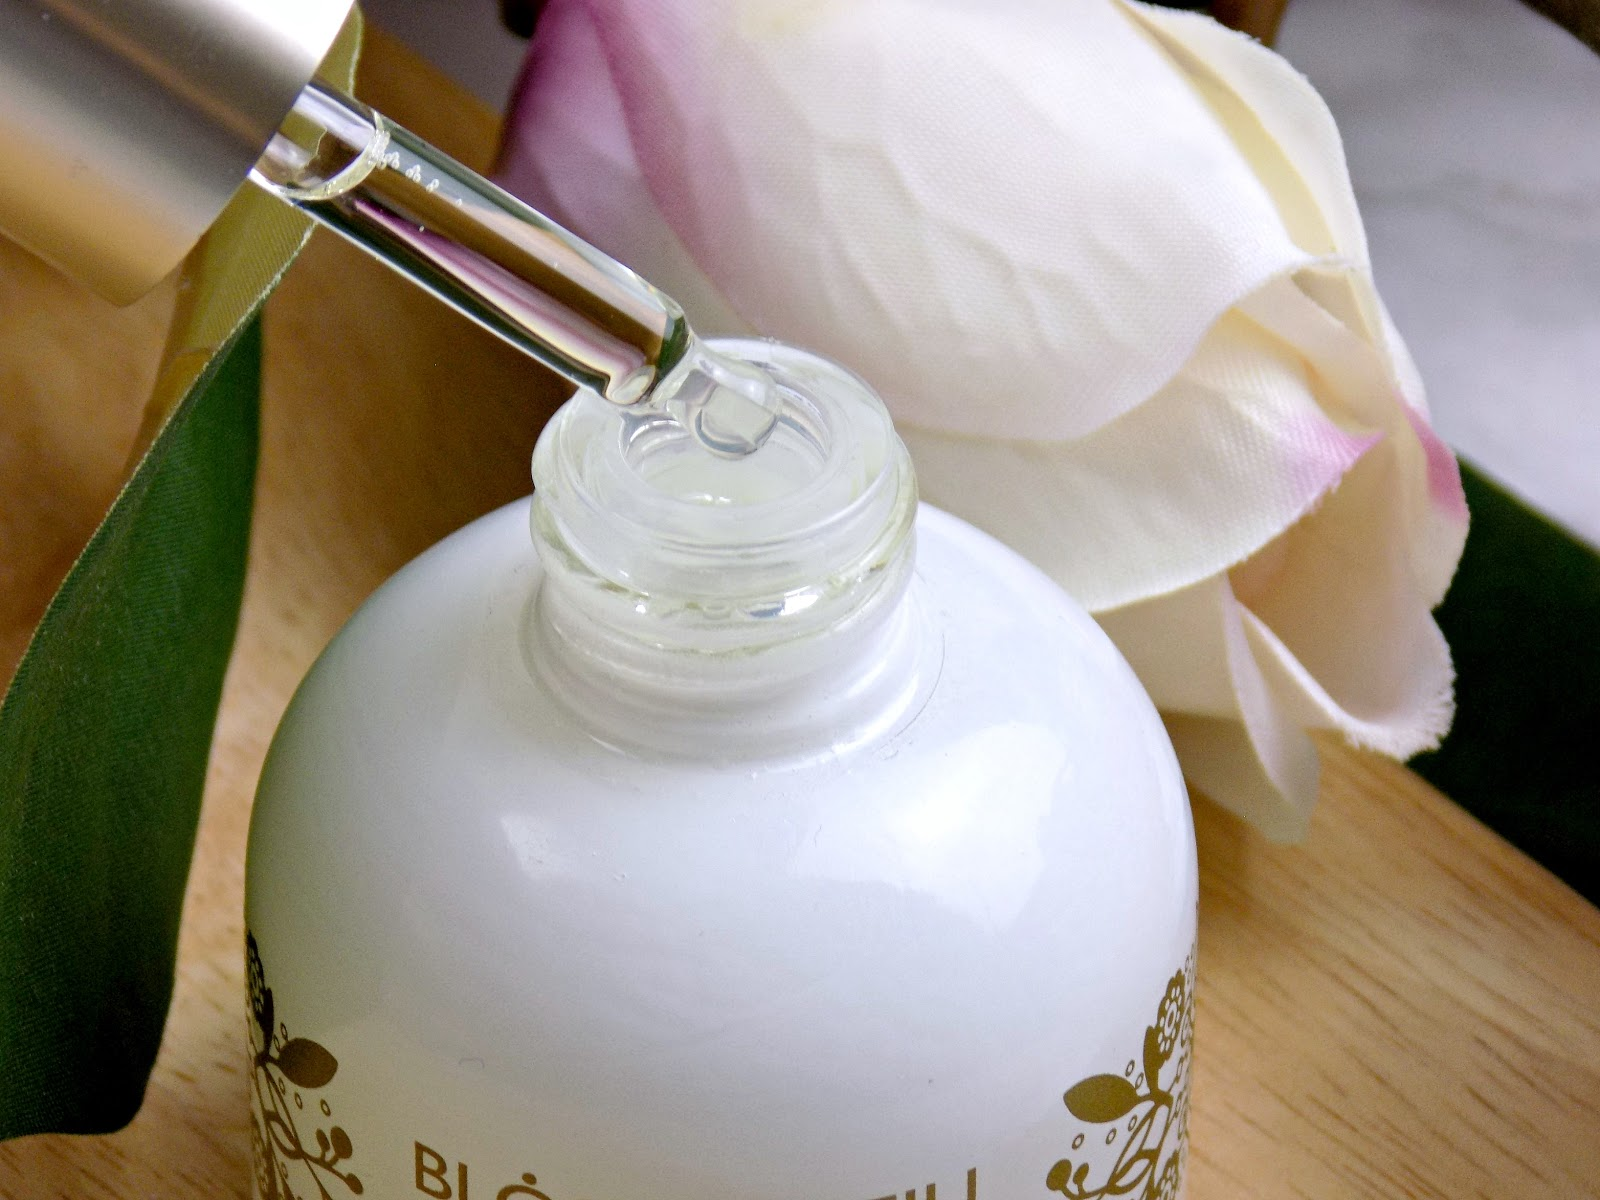 Blossom Jeju Camellia Soombi Essence Oil